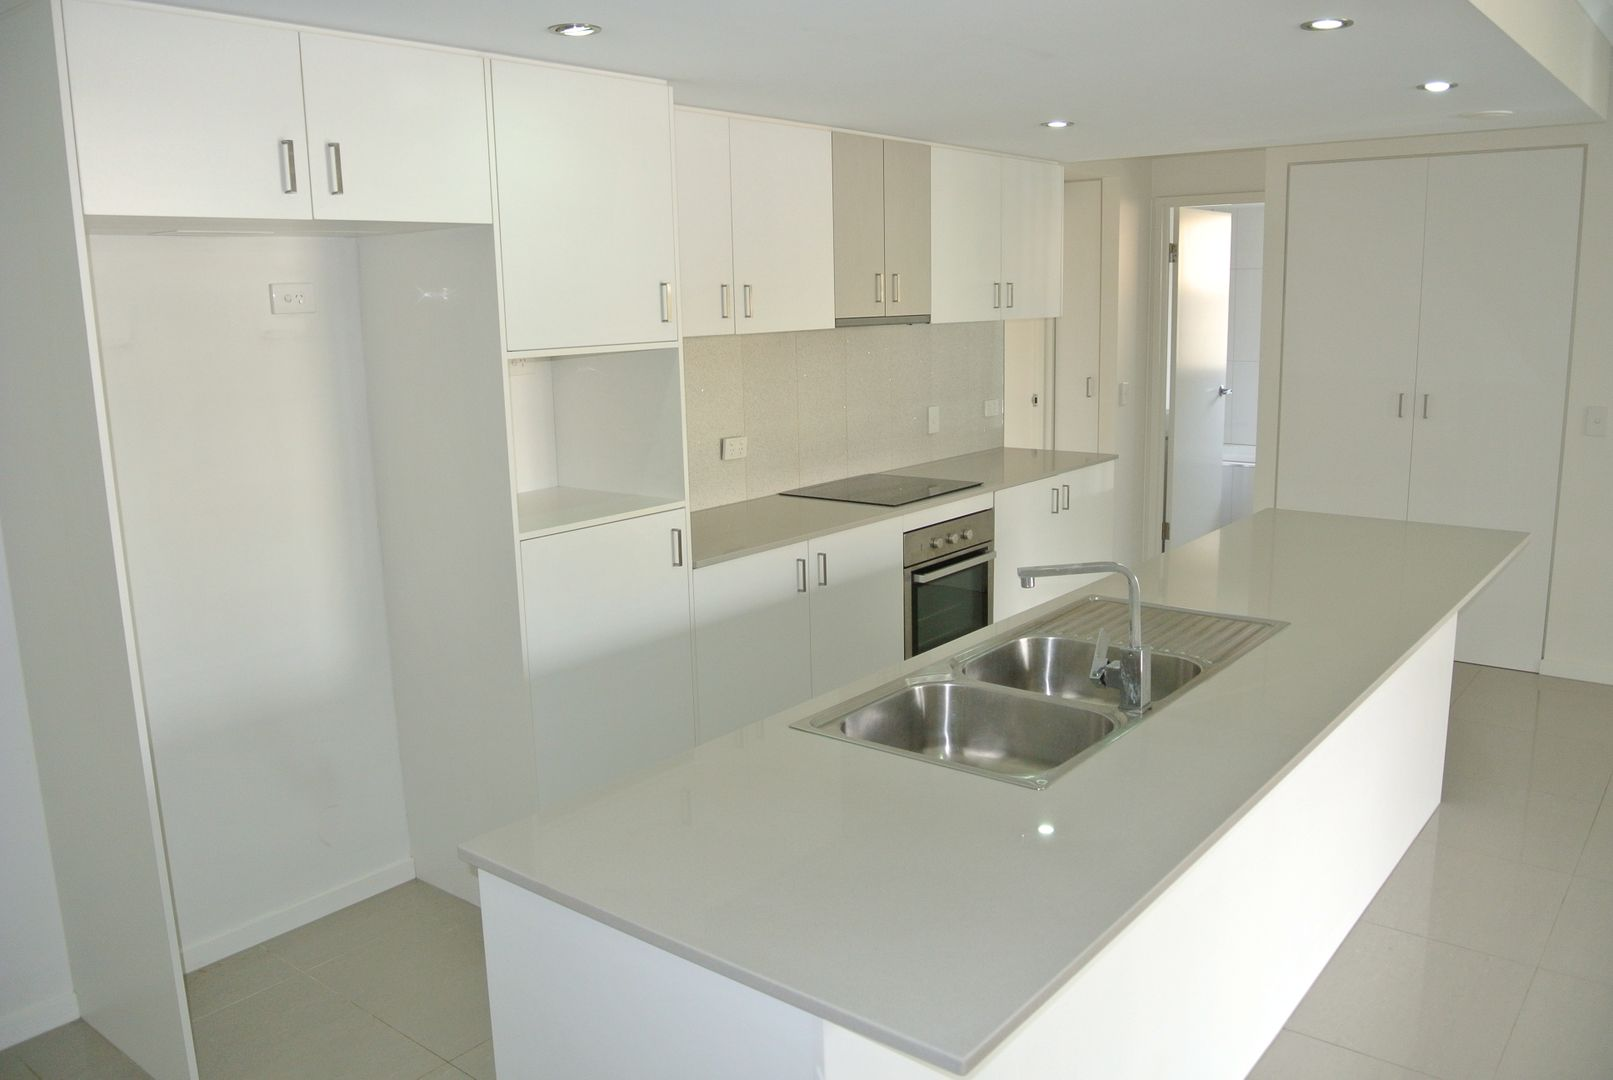 14/36 Kitchener Street, Coorparoo QLD 4151, Image 1